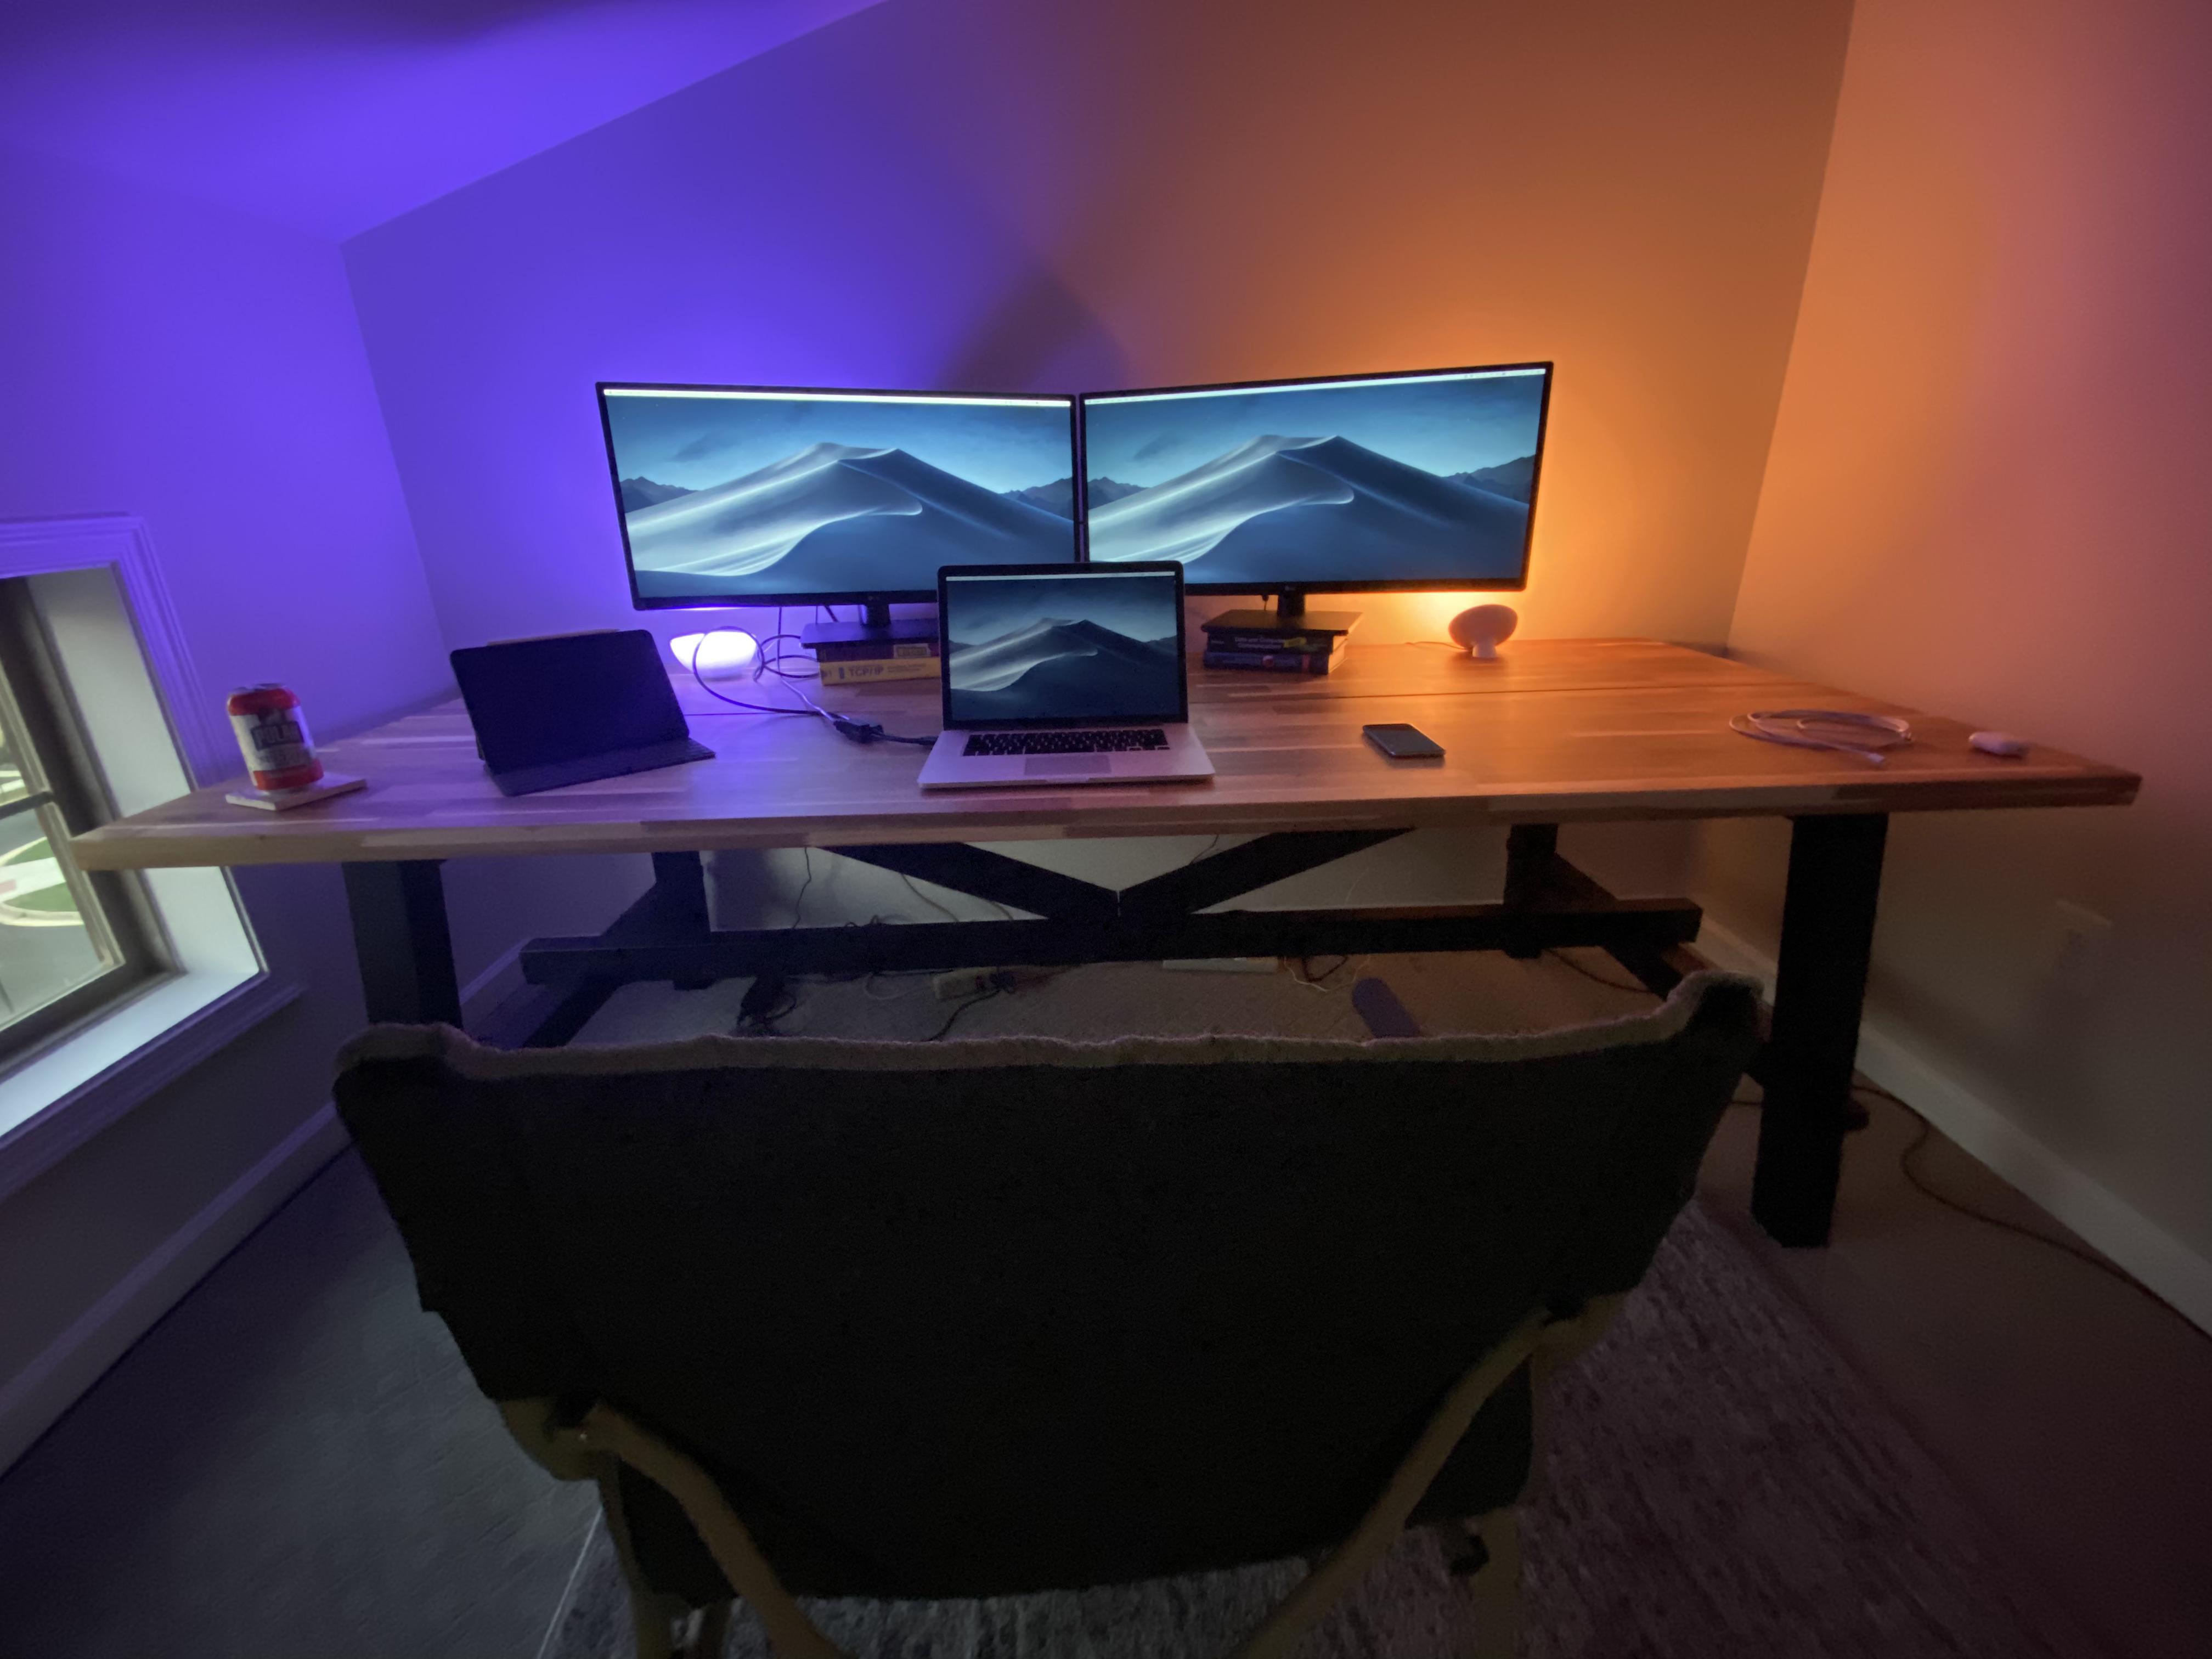 macbook led setup